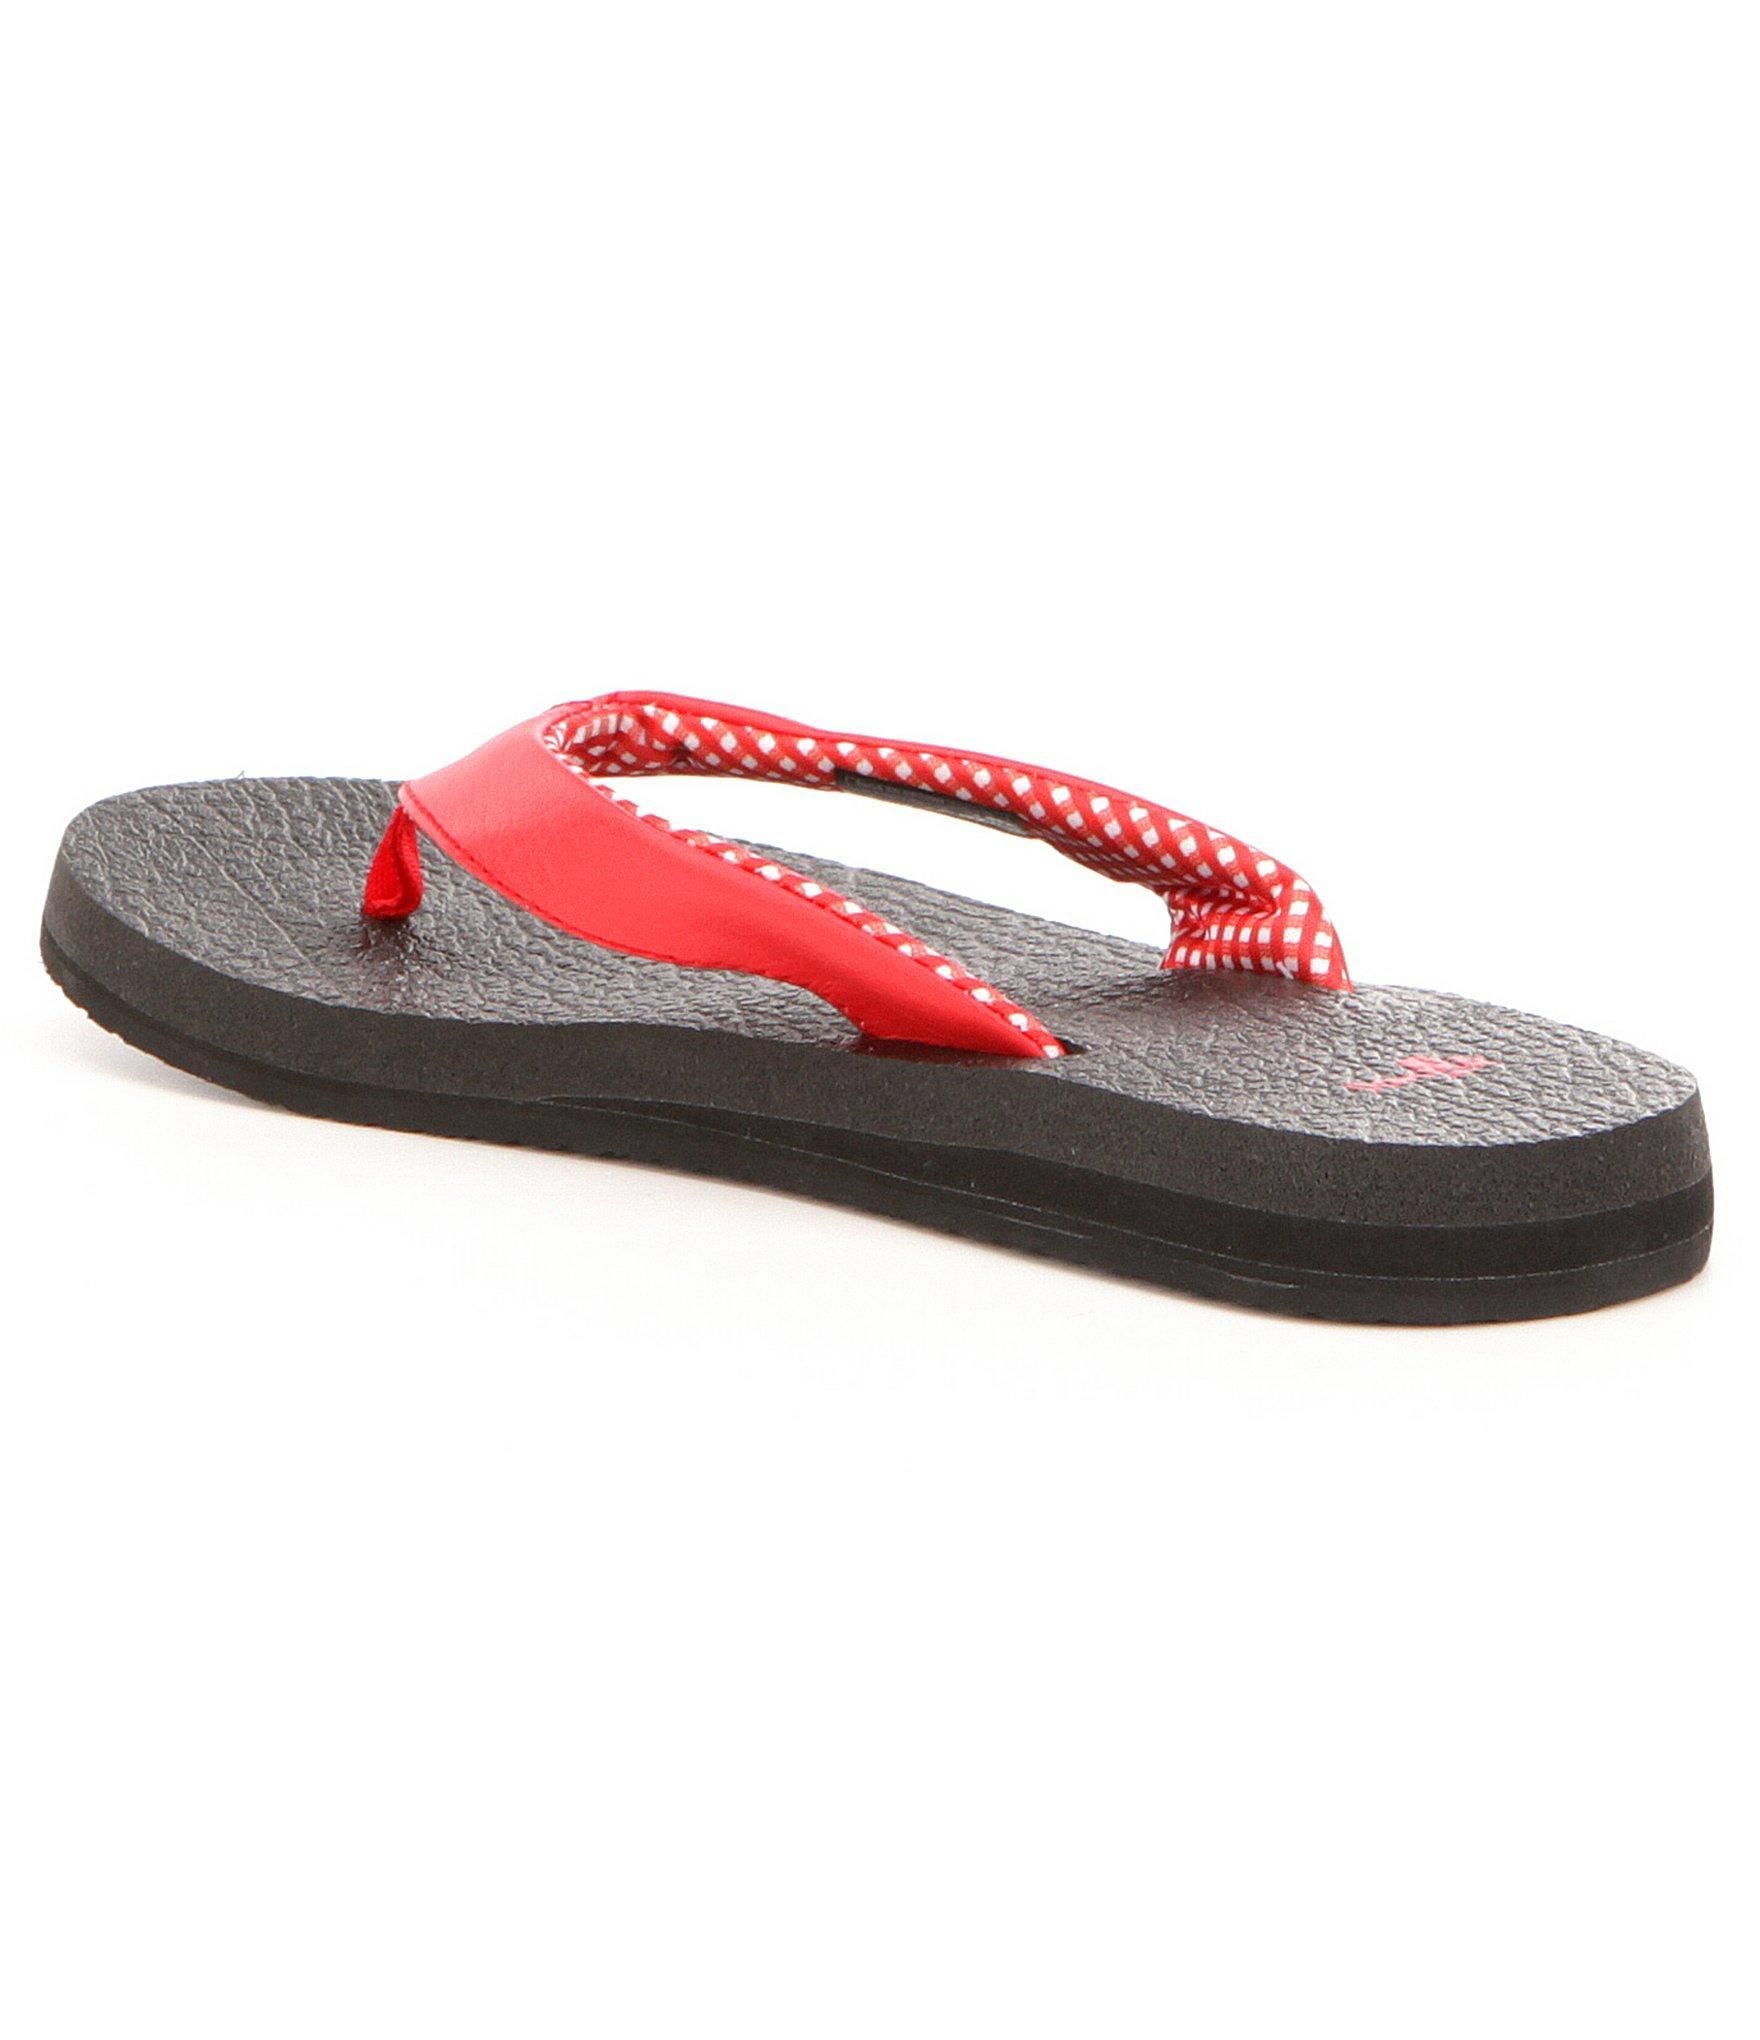 Sanuk Yoga Mat Flip Flop Sandals In Red  Lyst-2215